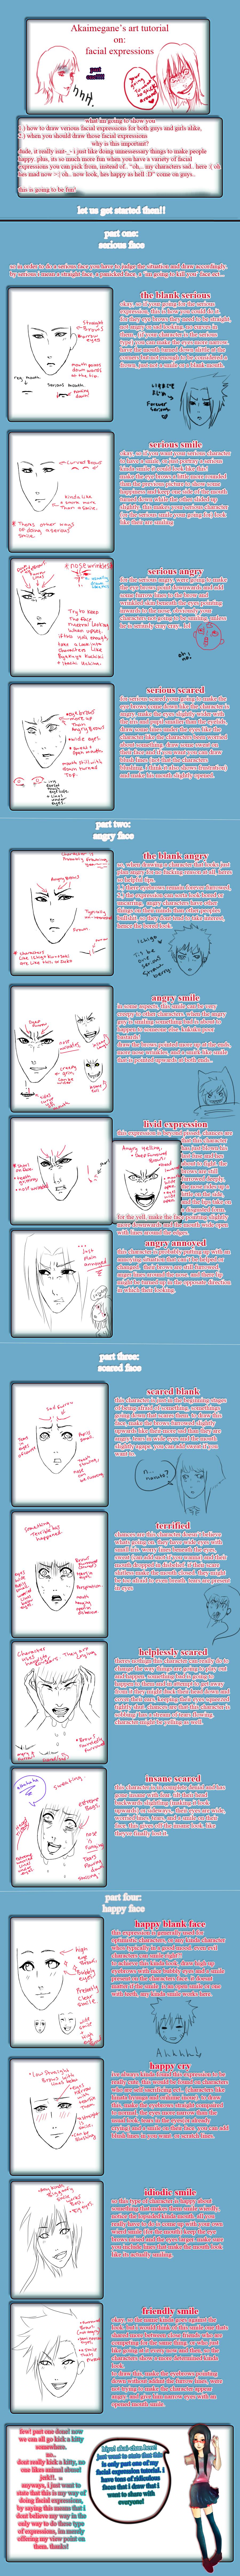 facial expression tutorial: part 1 by akaimegane